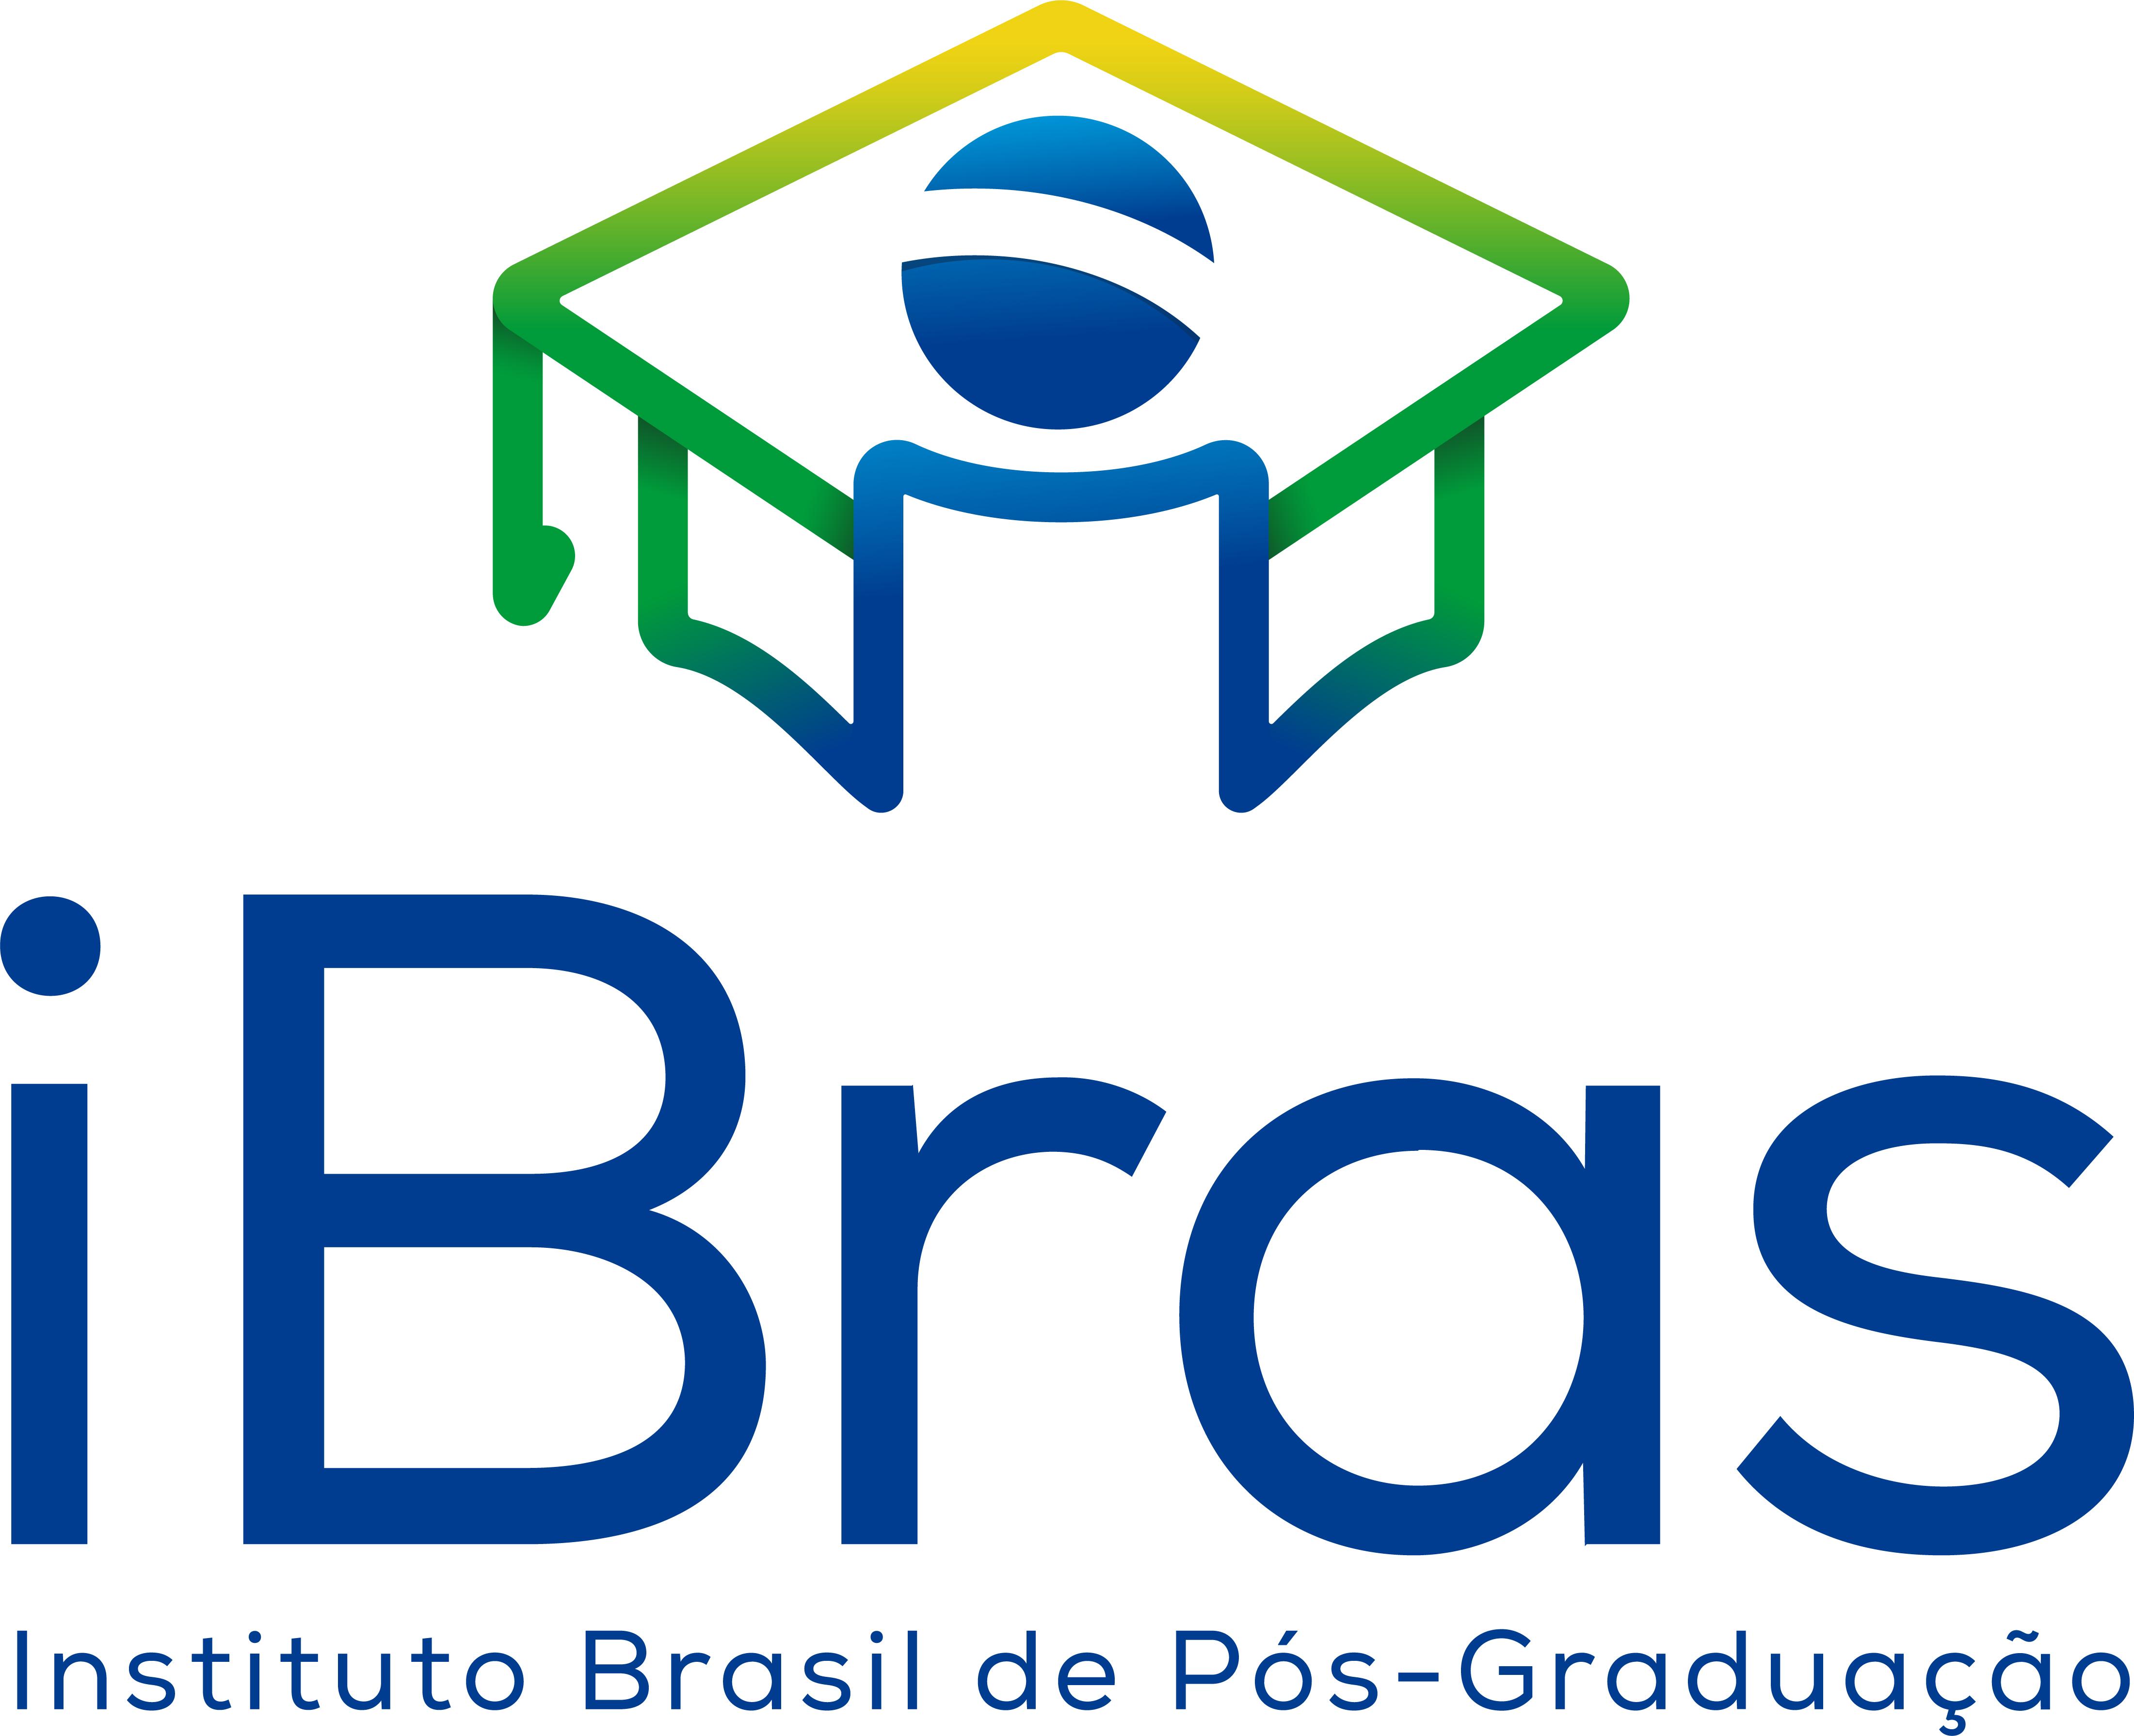 Santi & Savi Pós Graduação E Assessoria Ltda